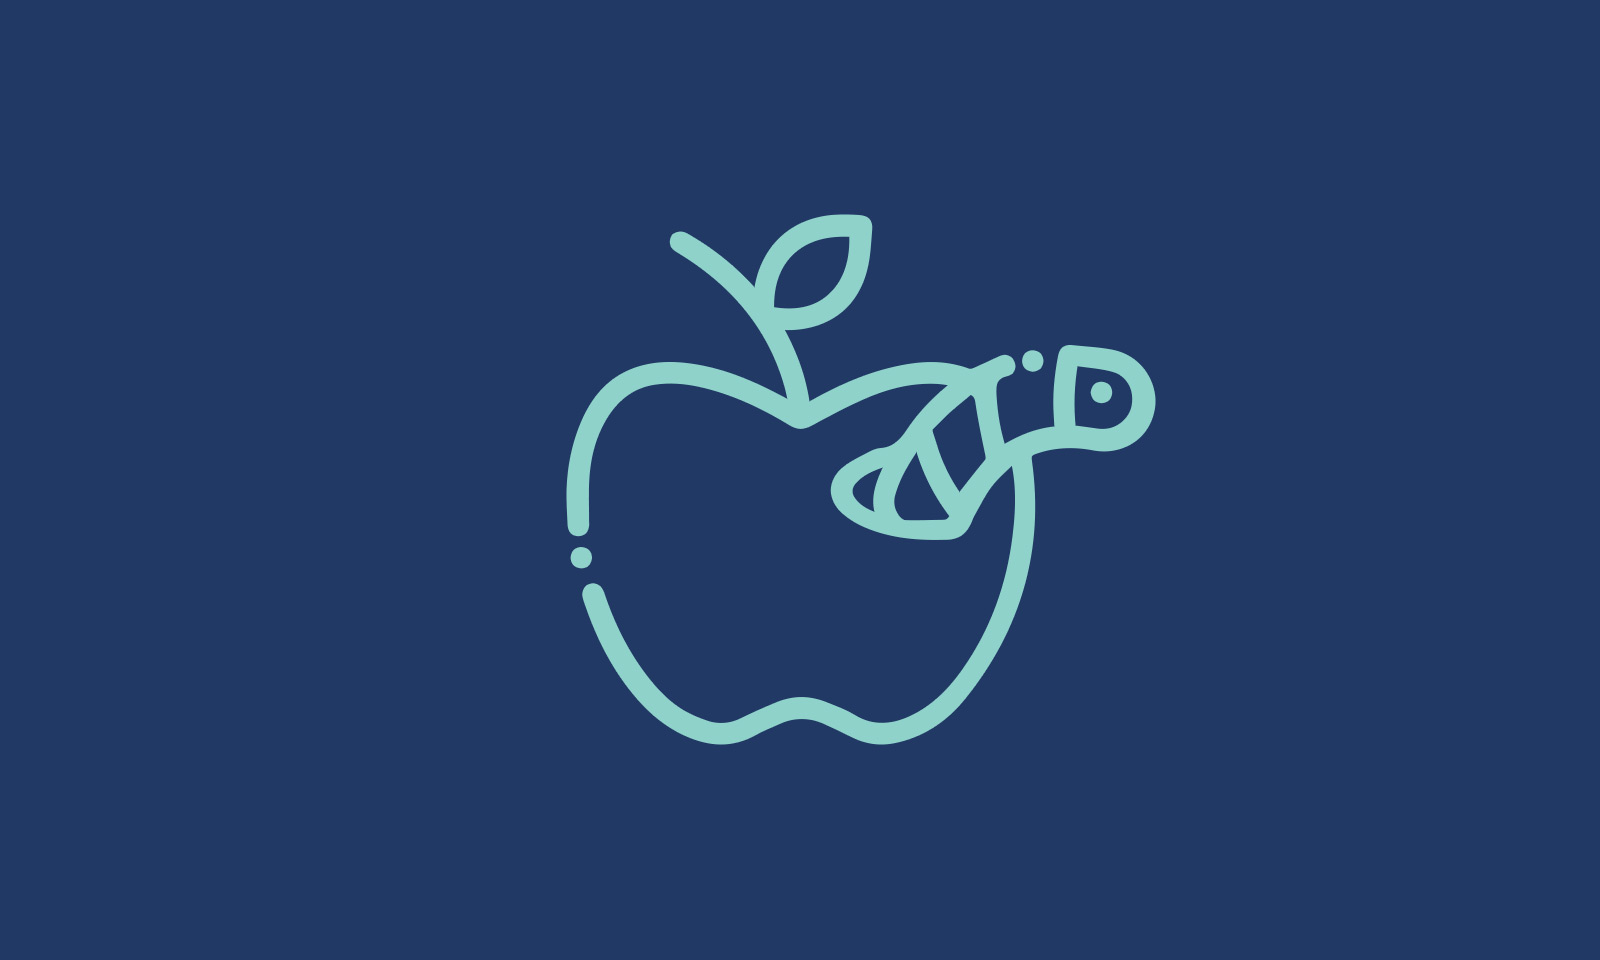 iOS runtime mobile exploration with Objection, или Хакаем собственное приложение - 1